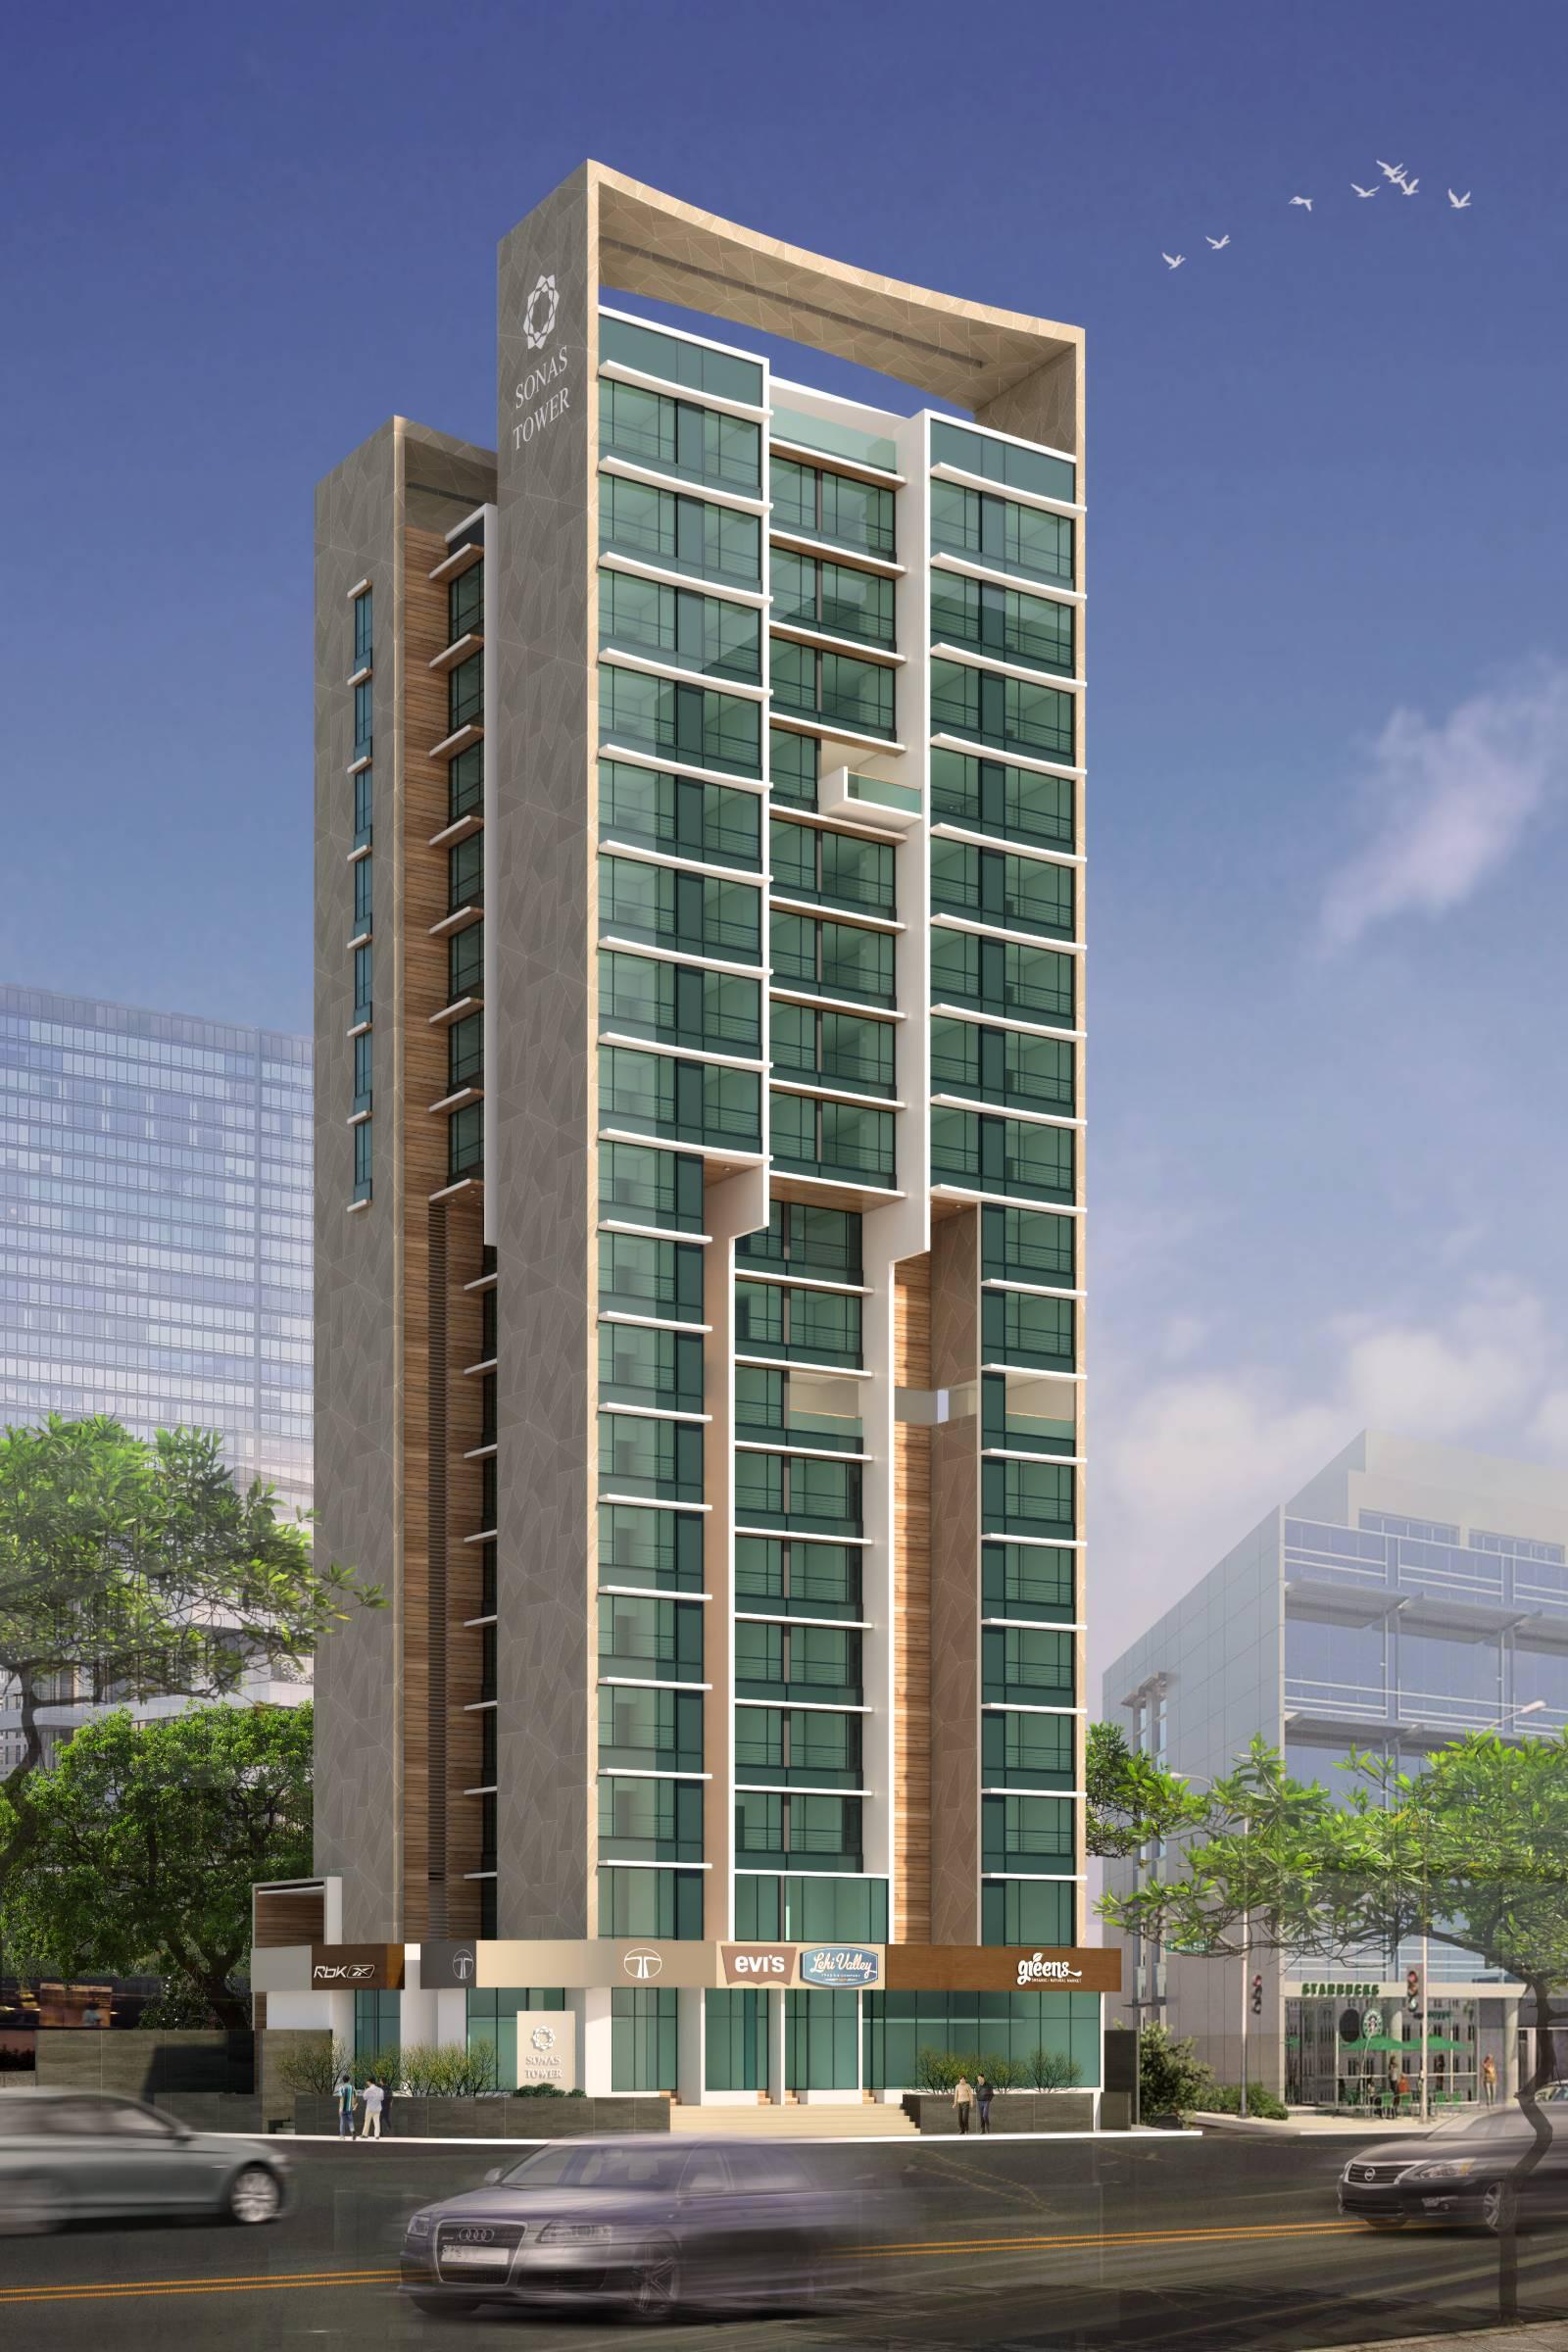 Sonas Towers High-rise Housing full view